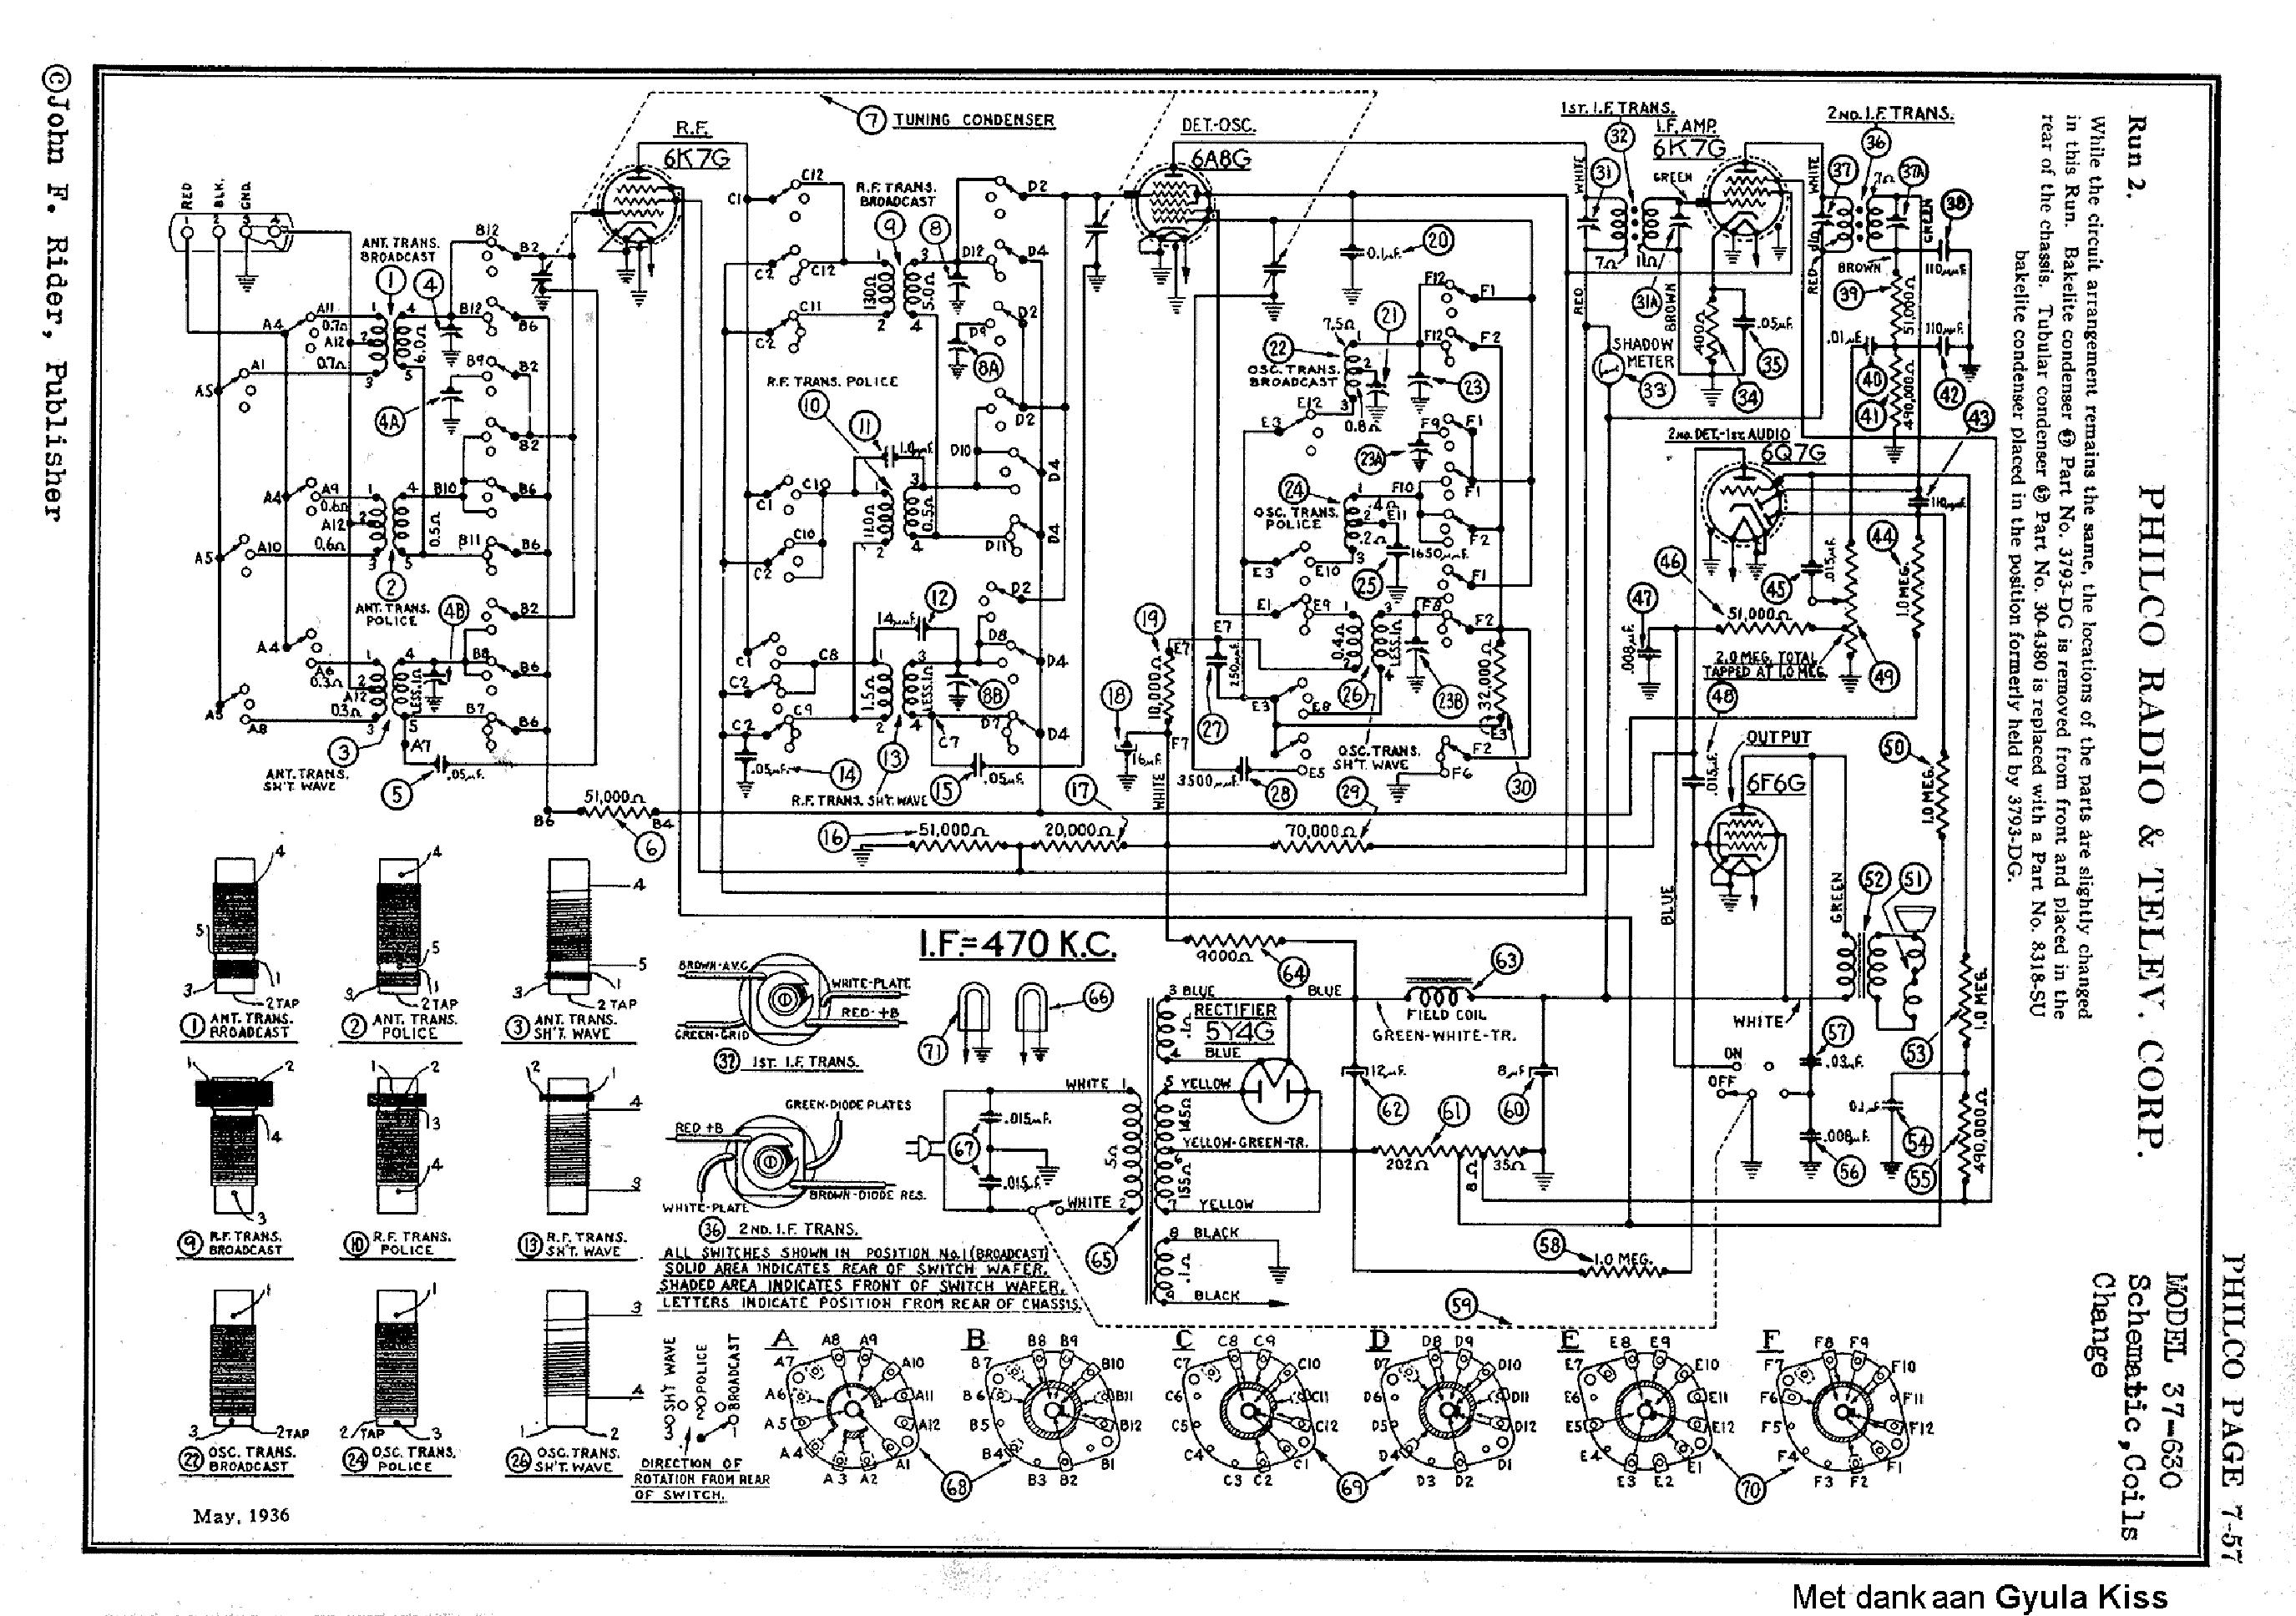 Philco Air Handler Wiring Diagram - Fusebox and Wiring Diagram  visualdraw-knee - visualdraw-knee.crealla.itdiagram database